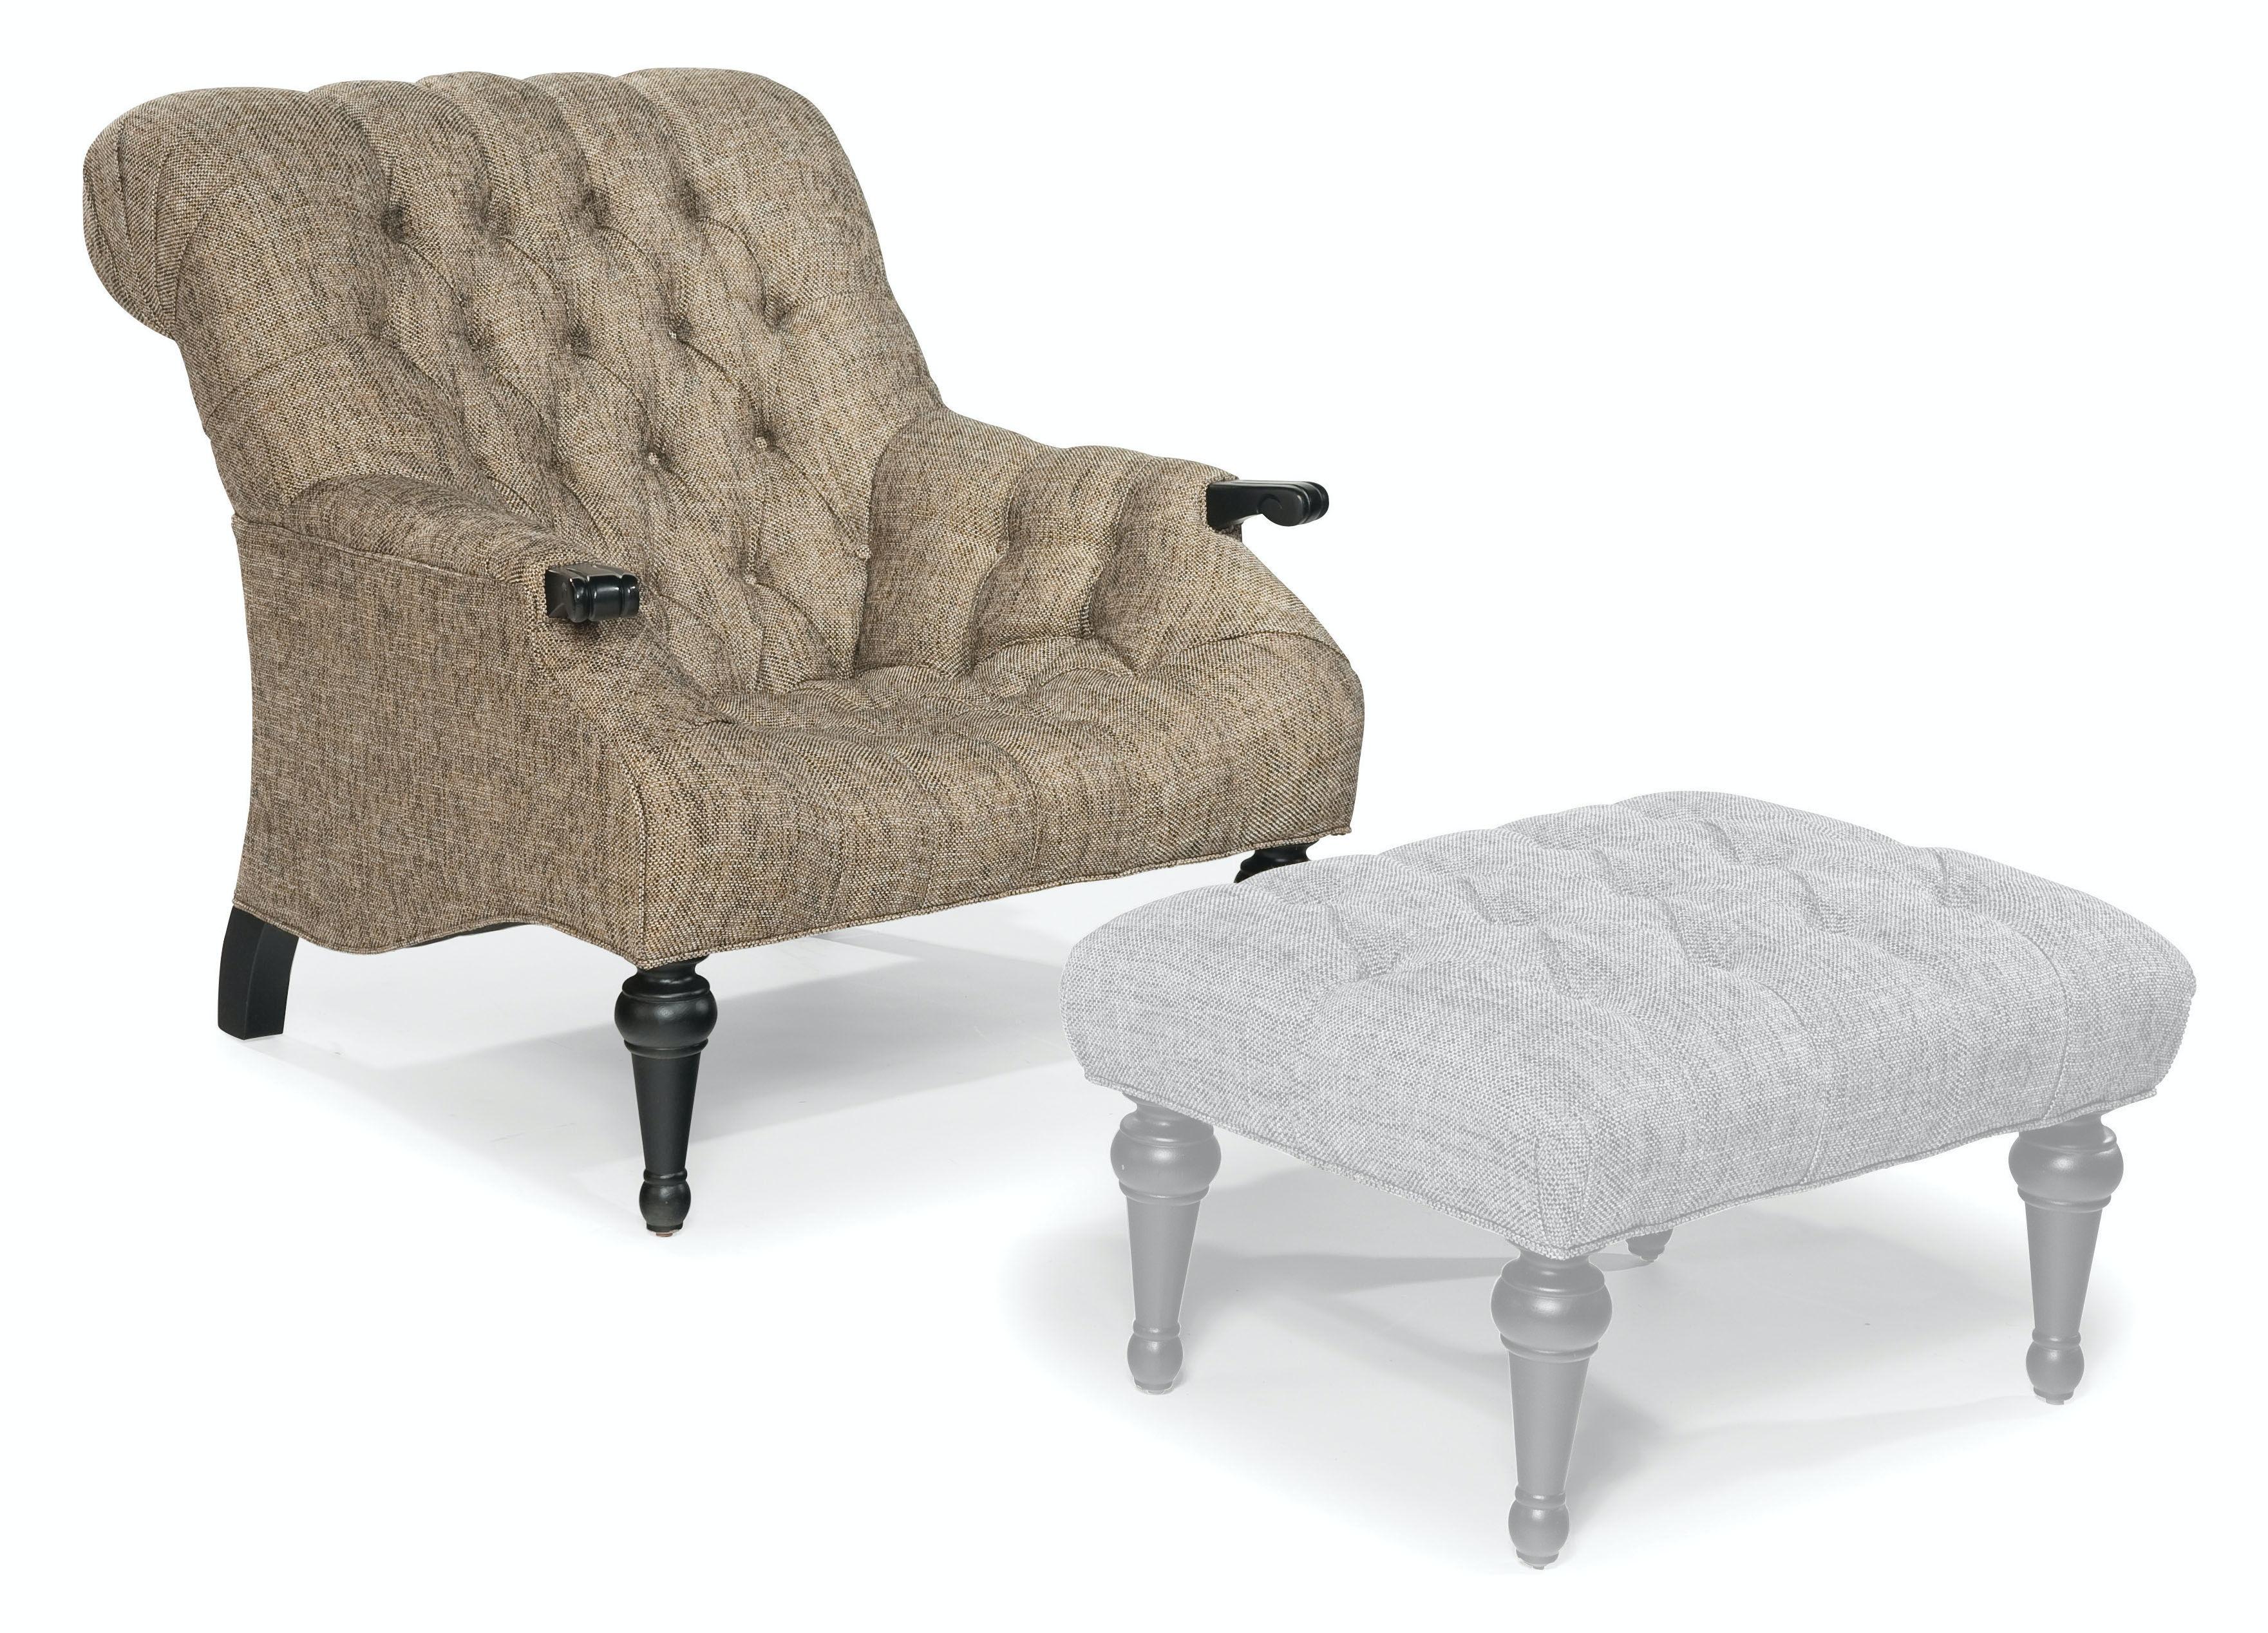 Attirant Fairfield Chair Company Living Room Sinclair Lounge Chair 1492 01 At D  Noblin Furniture